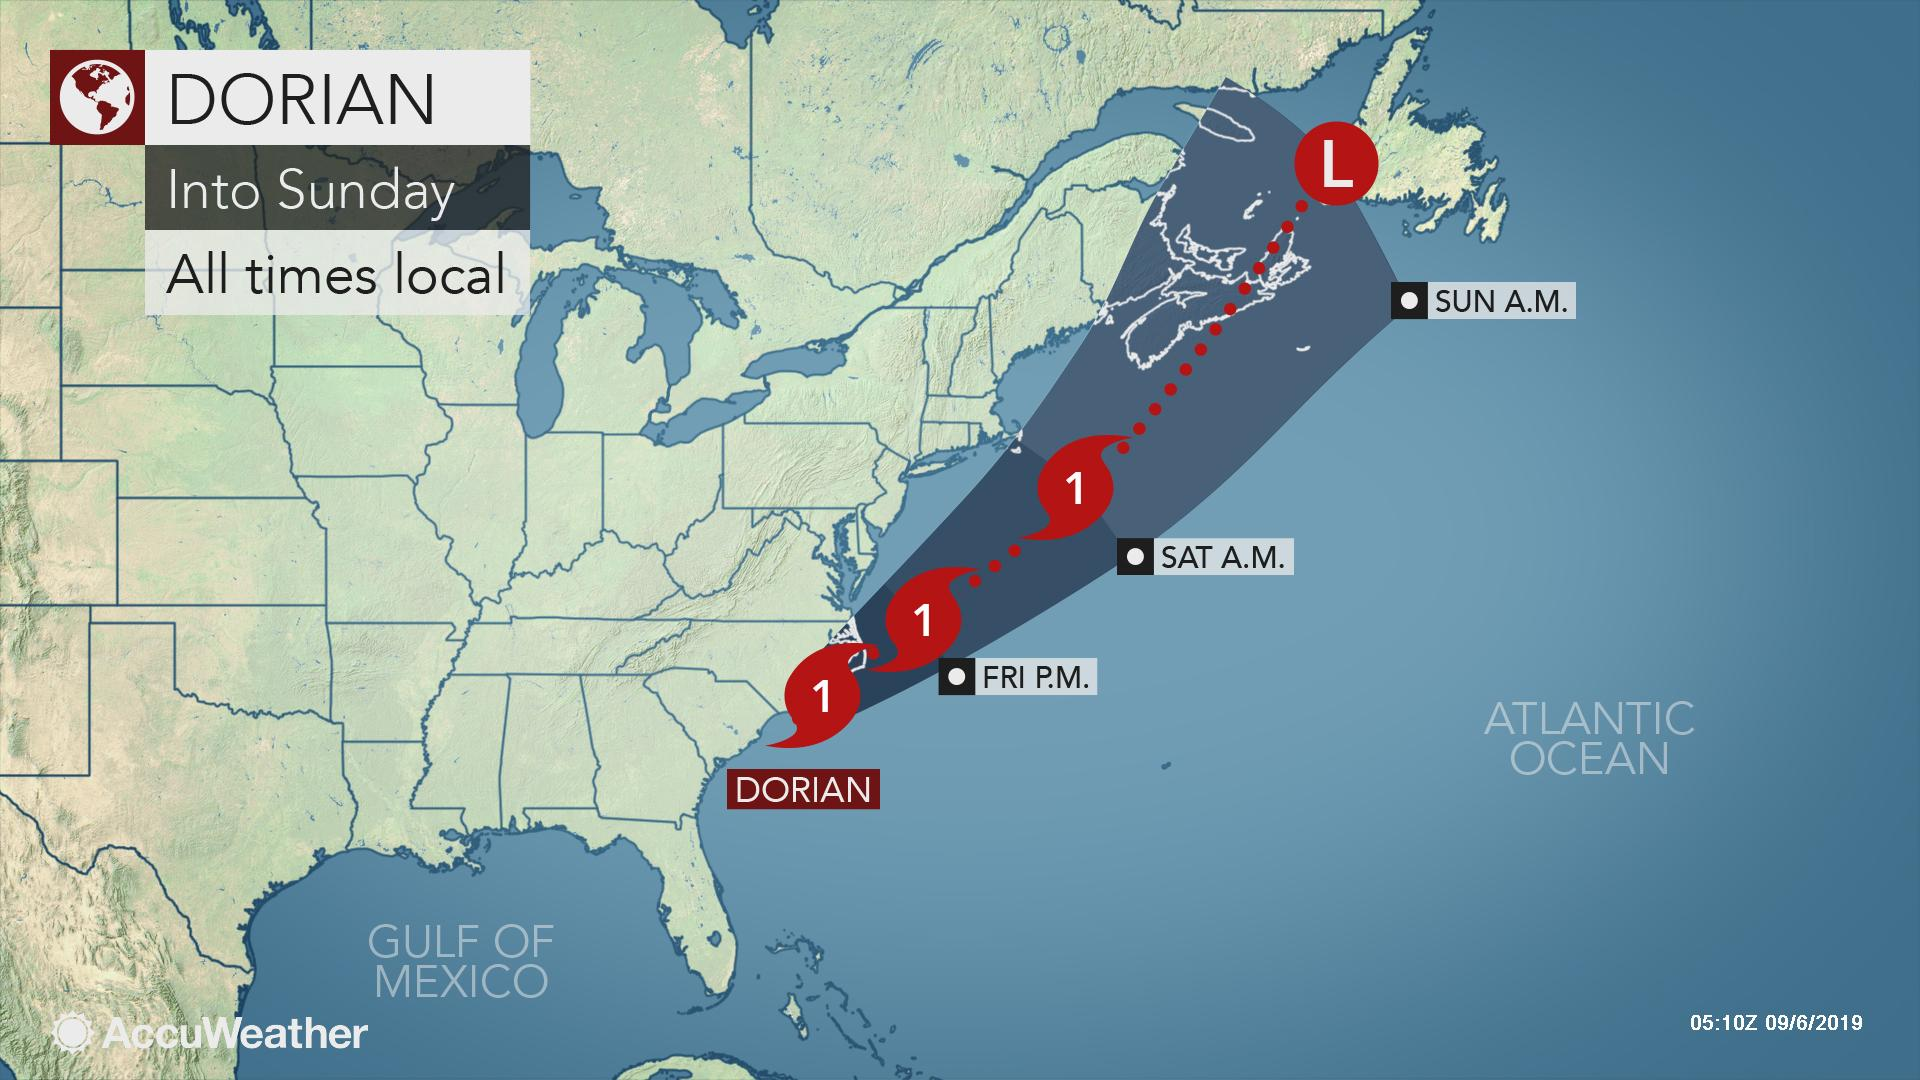 Hinesville Doppler Weather Radar Map - AccuWeather com